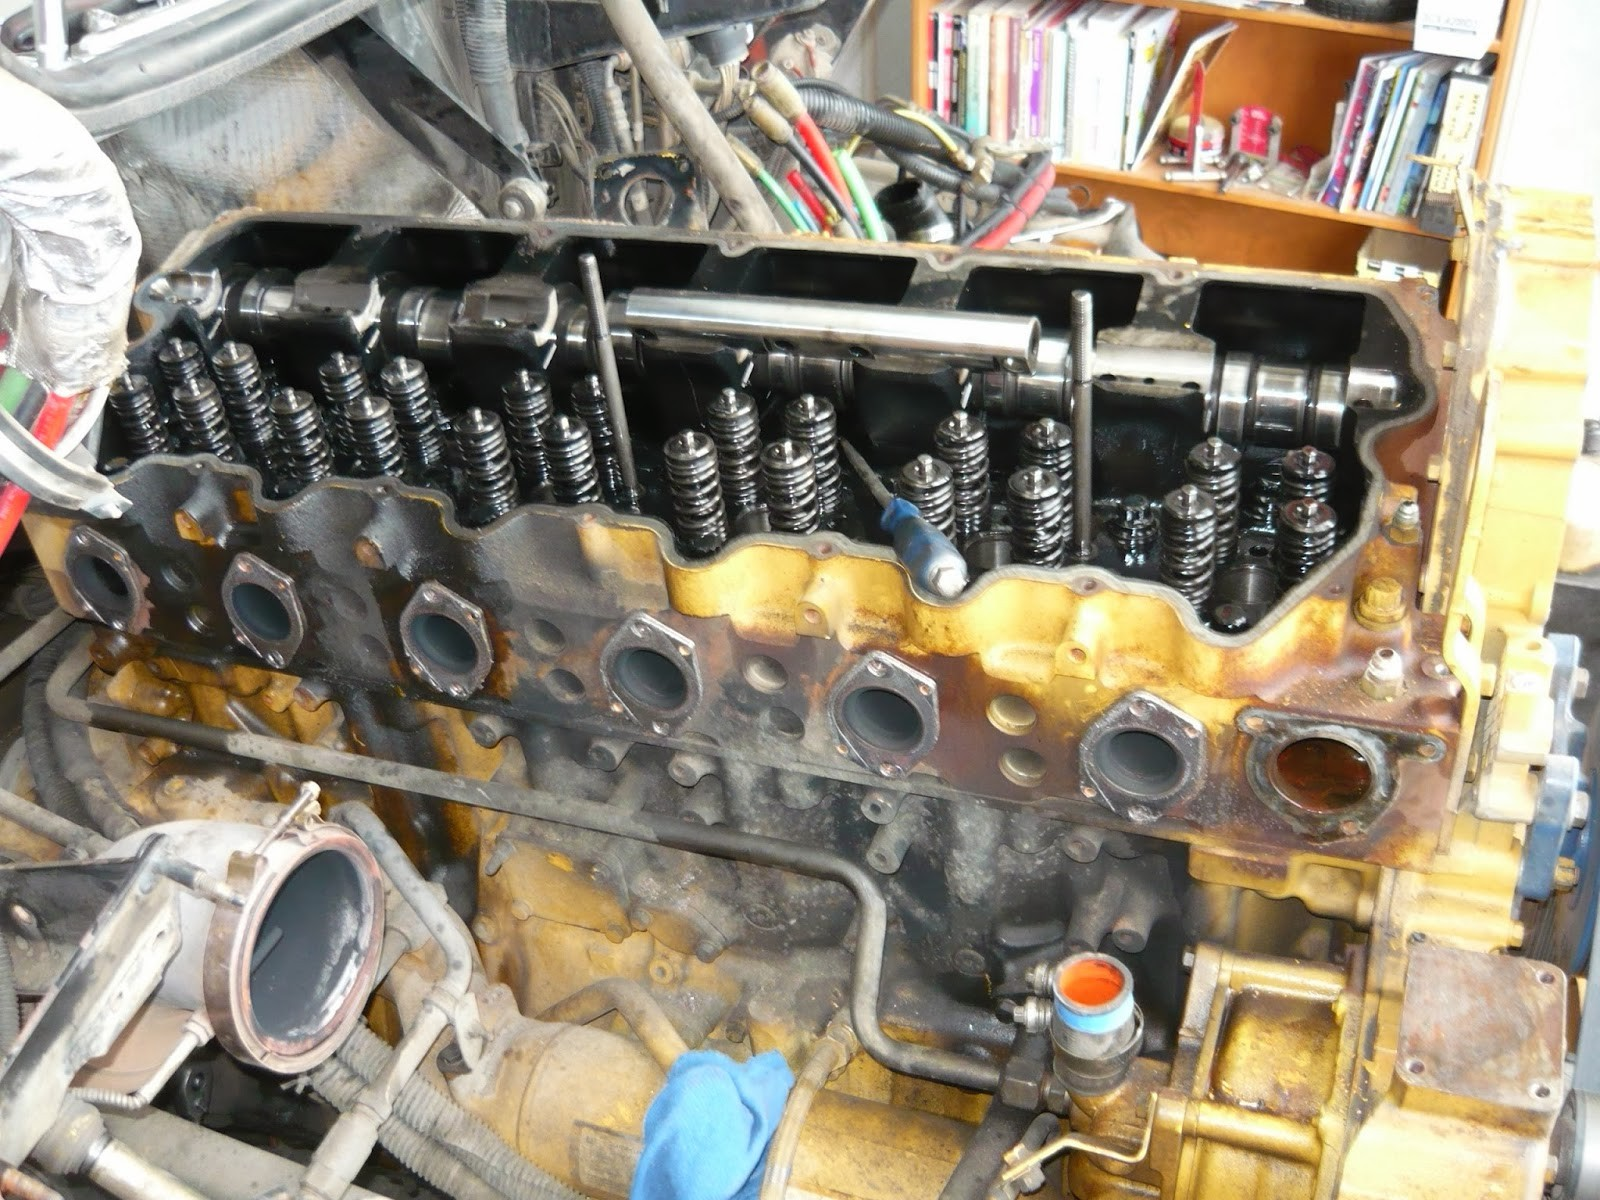 C15 Cat Engine Belt Diagram Caterpillar 3406e Good Running Christie Pacific Case History C12 Cylinder Head Failure Of